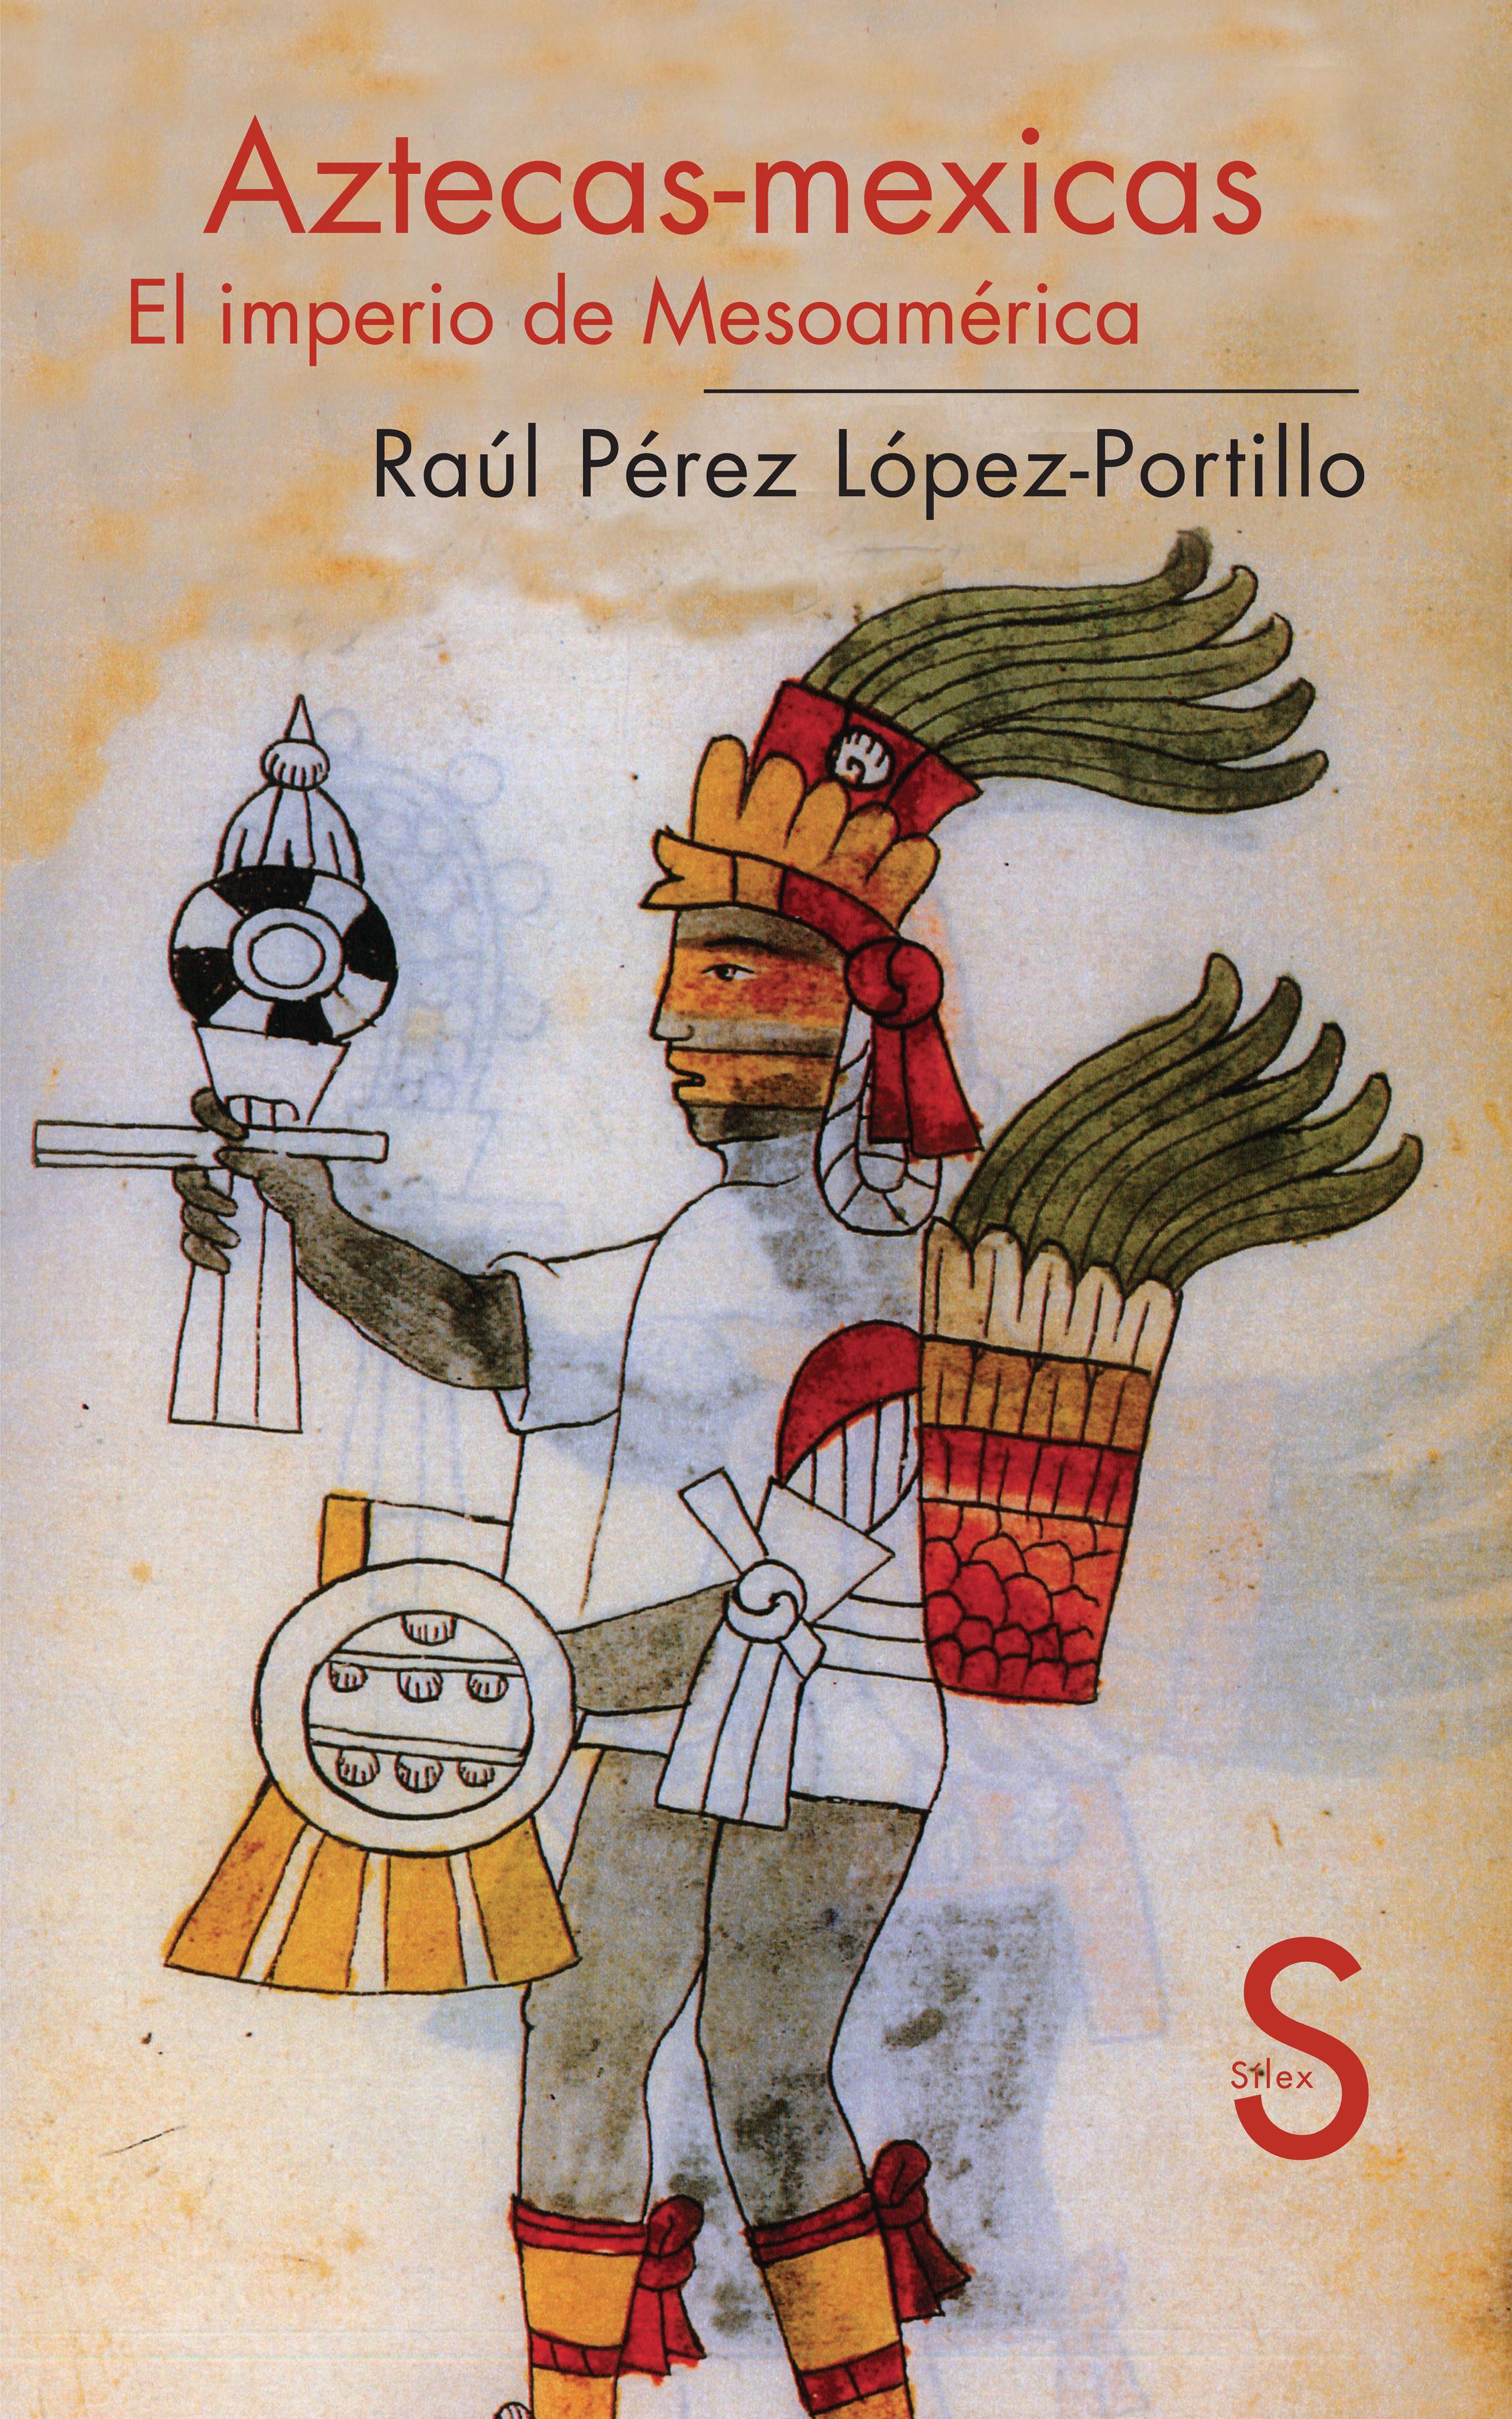 aztecas-mexicas: el imperio de mesoamerica-raul perez lopez-portillo-9788477375968